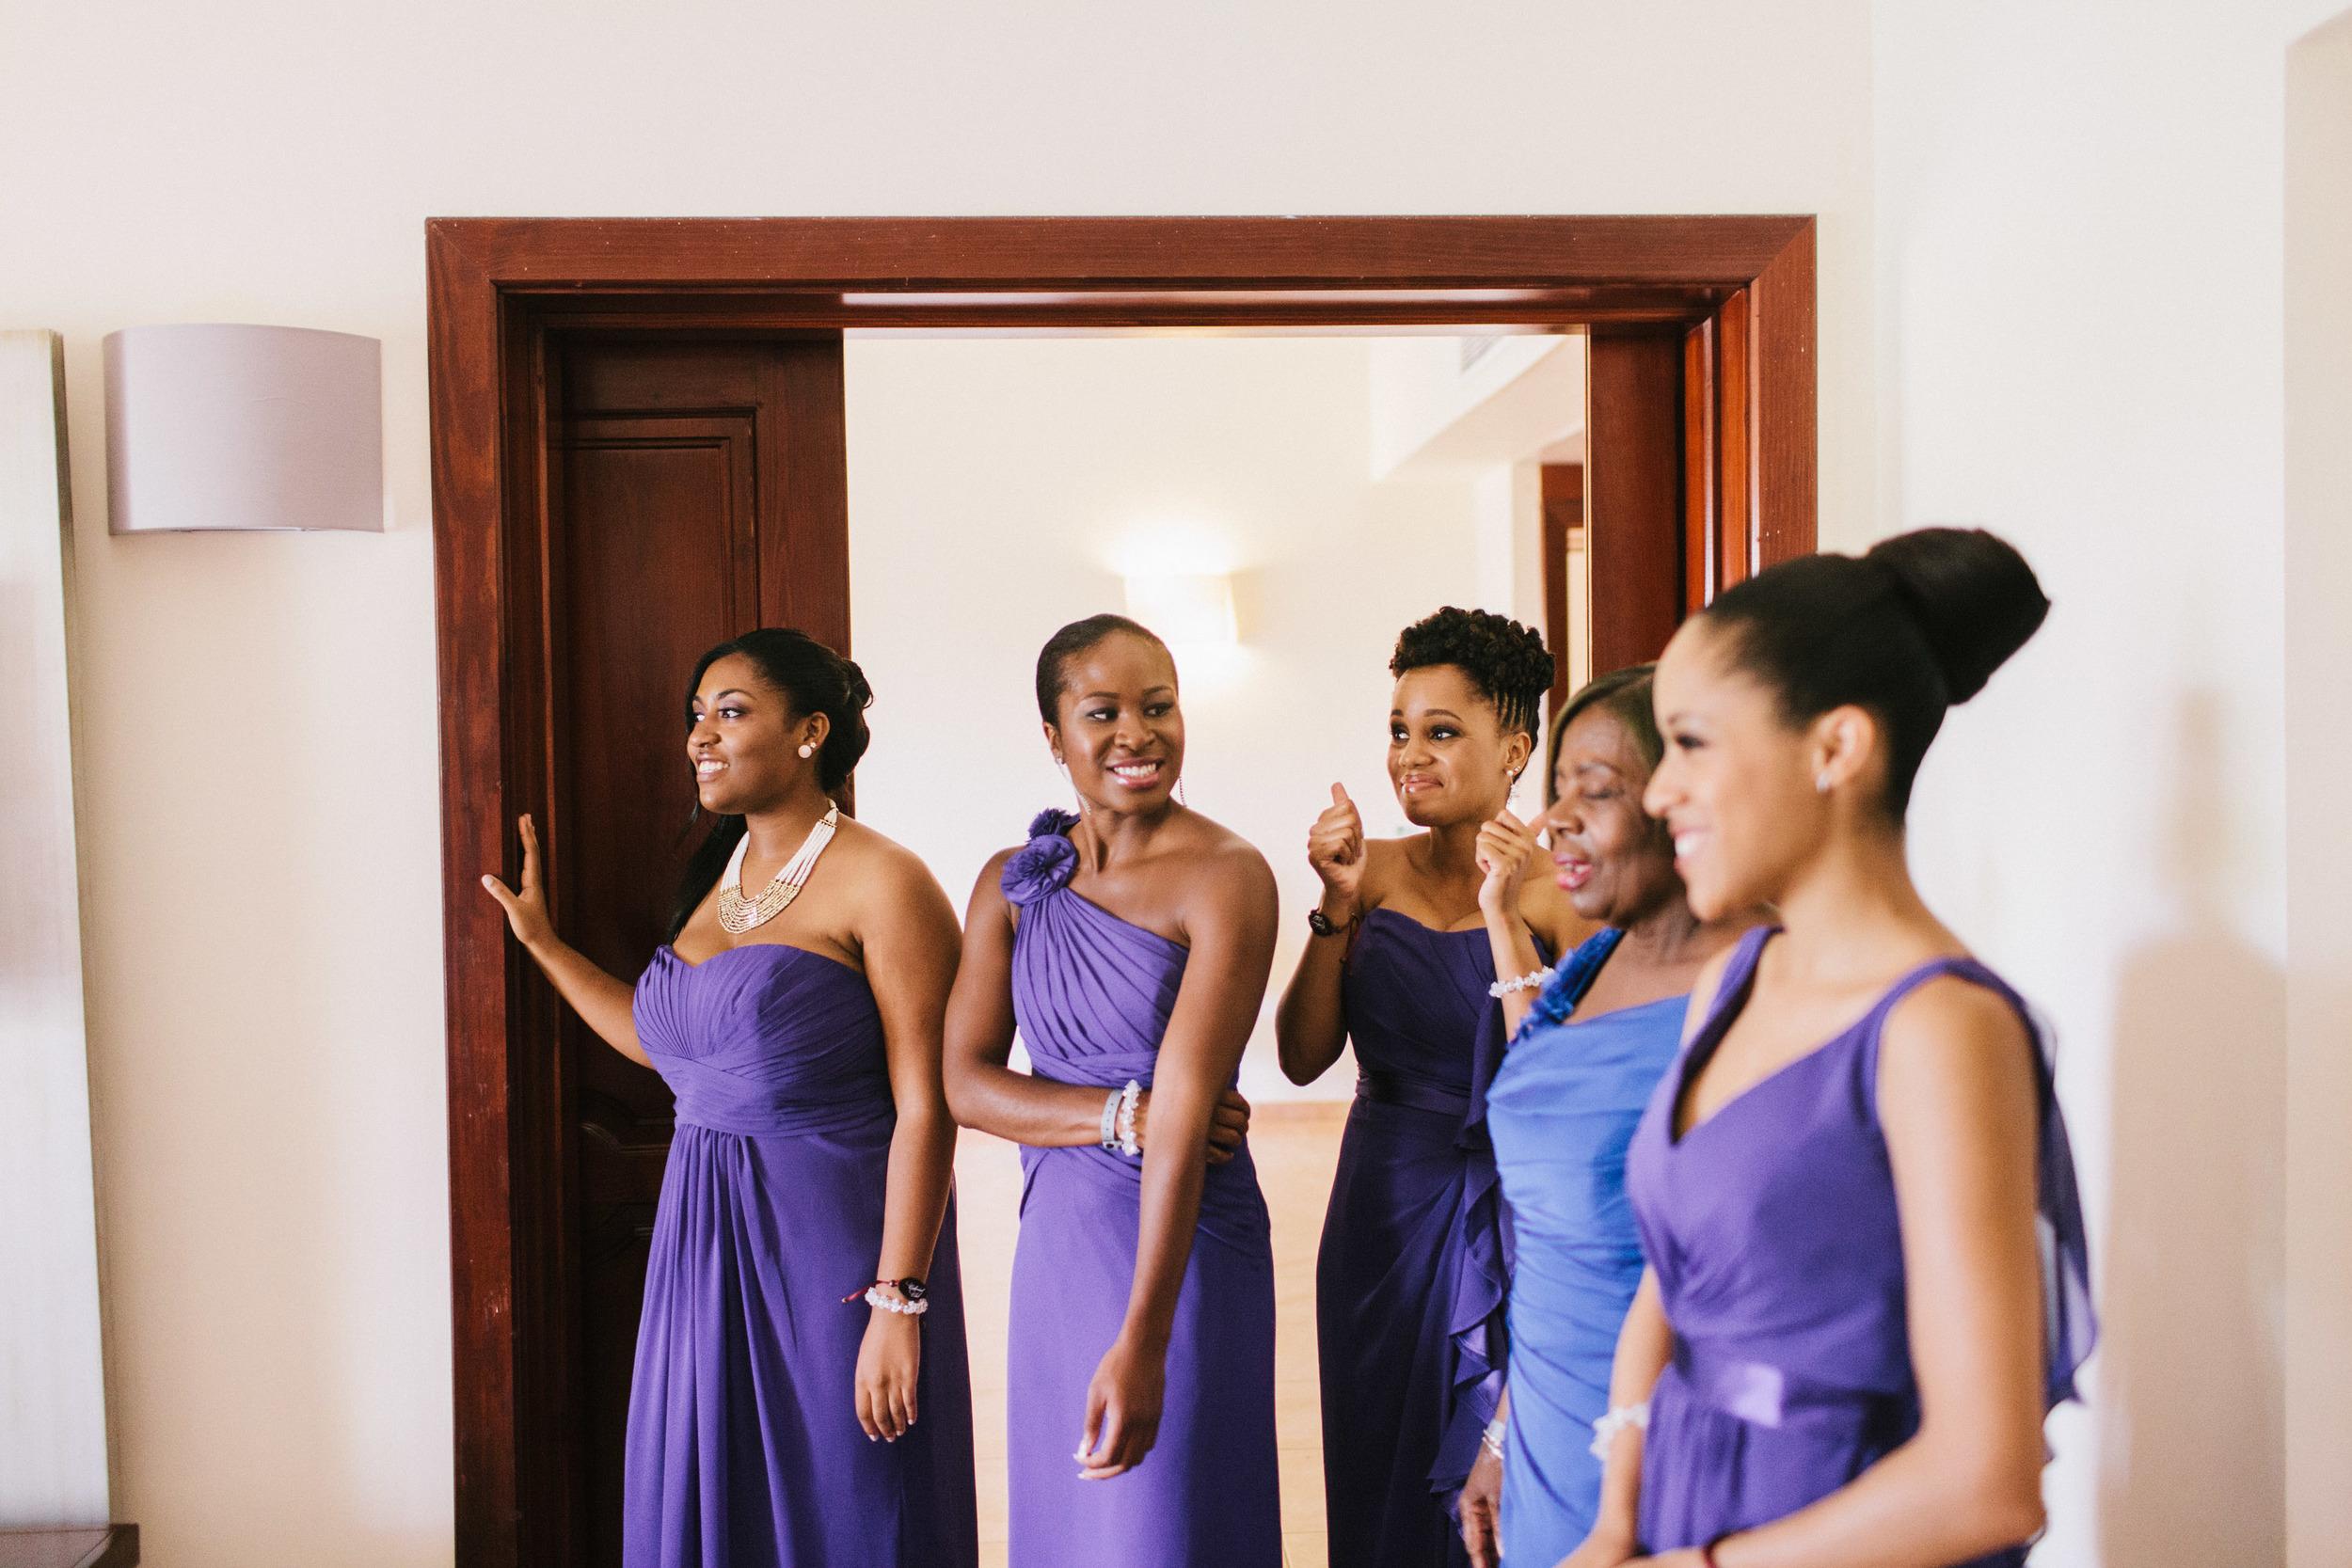 michael-rousseau-photography-dominican-republic-destination-wedding-cara-jason-colonial-majestic-dominican-republic053.jpg